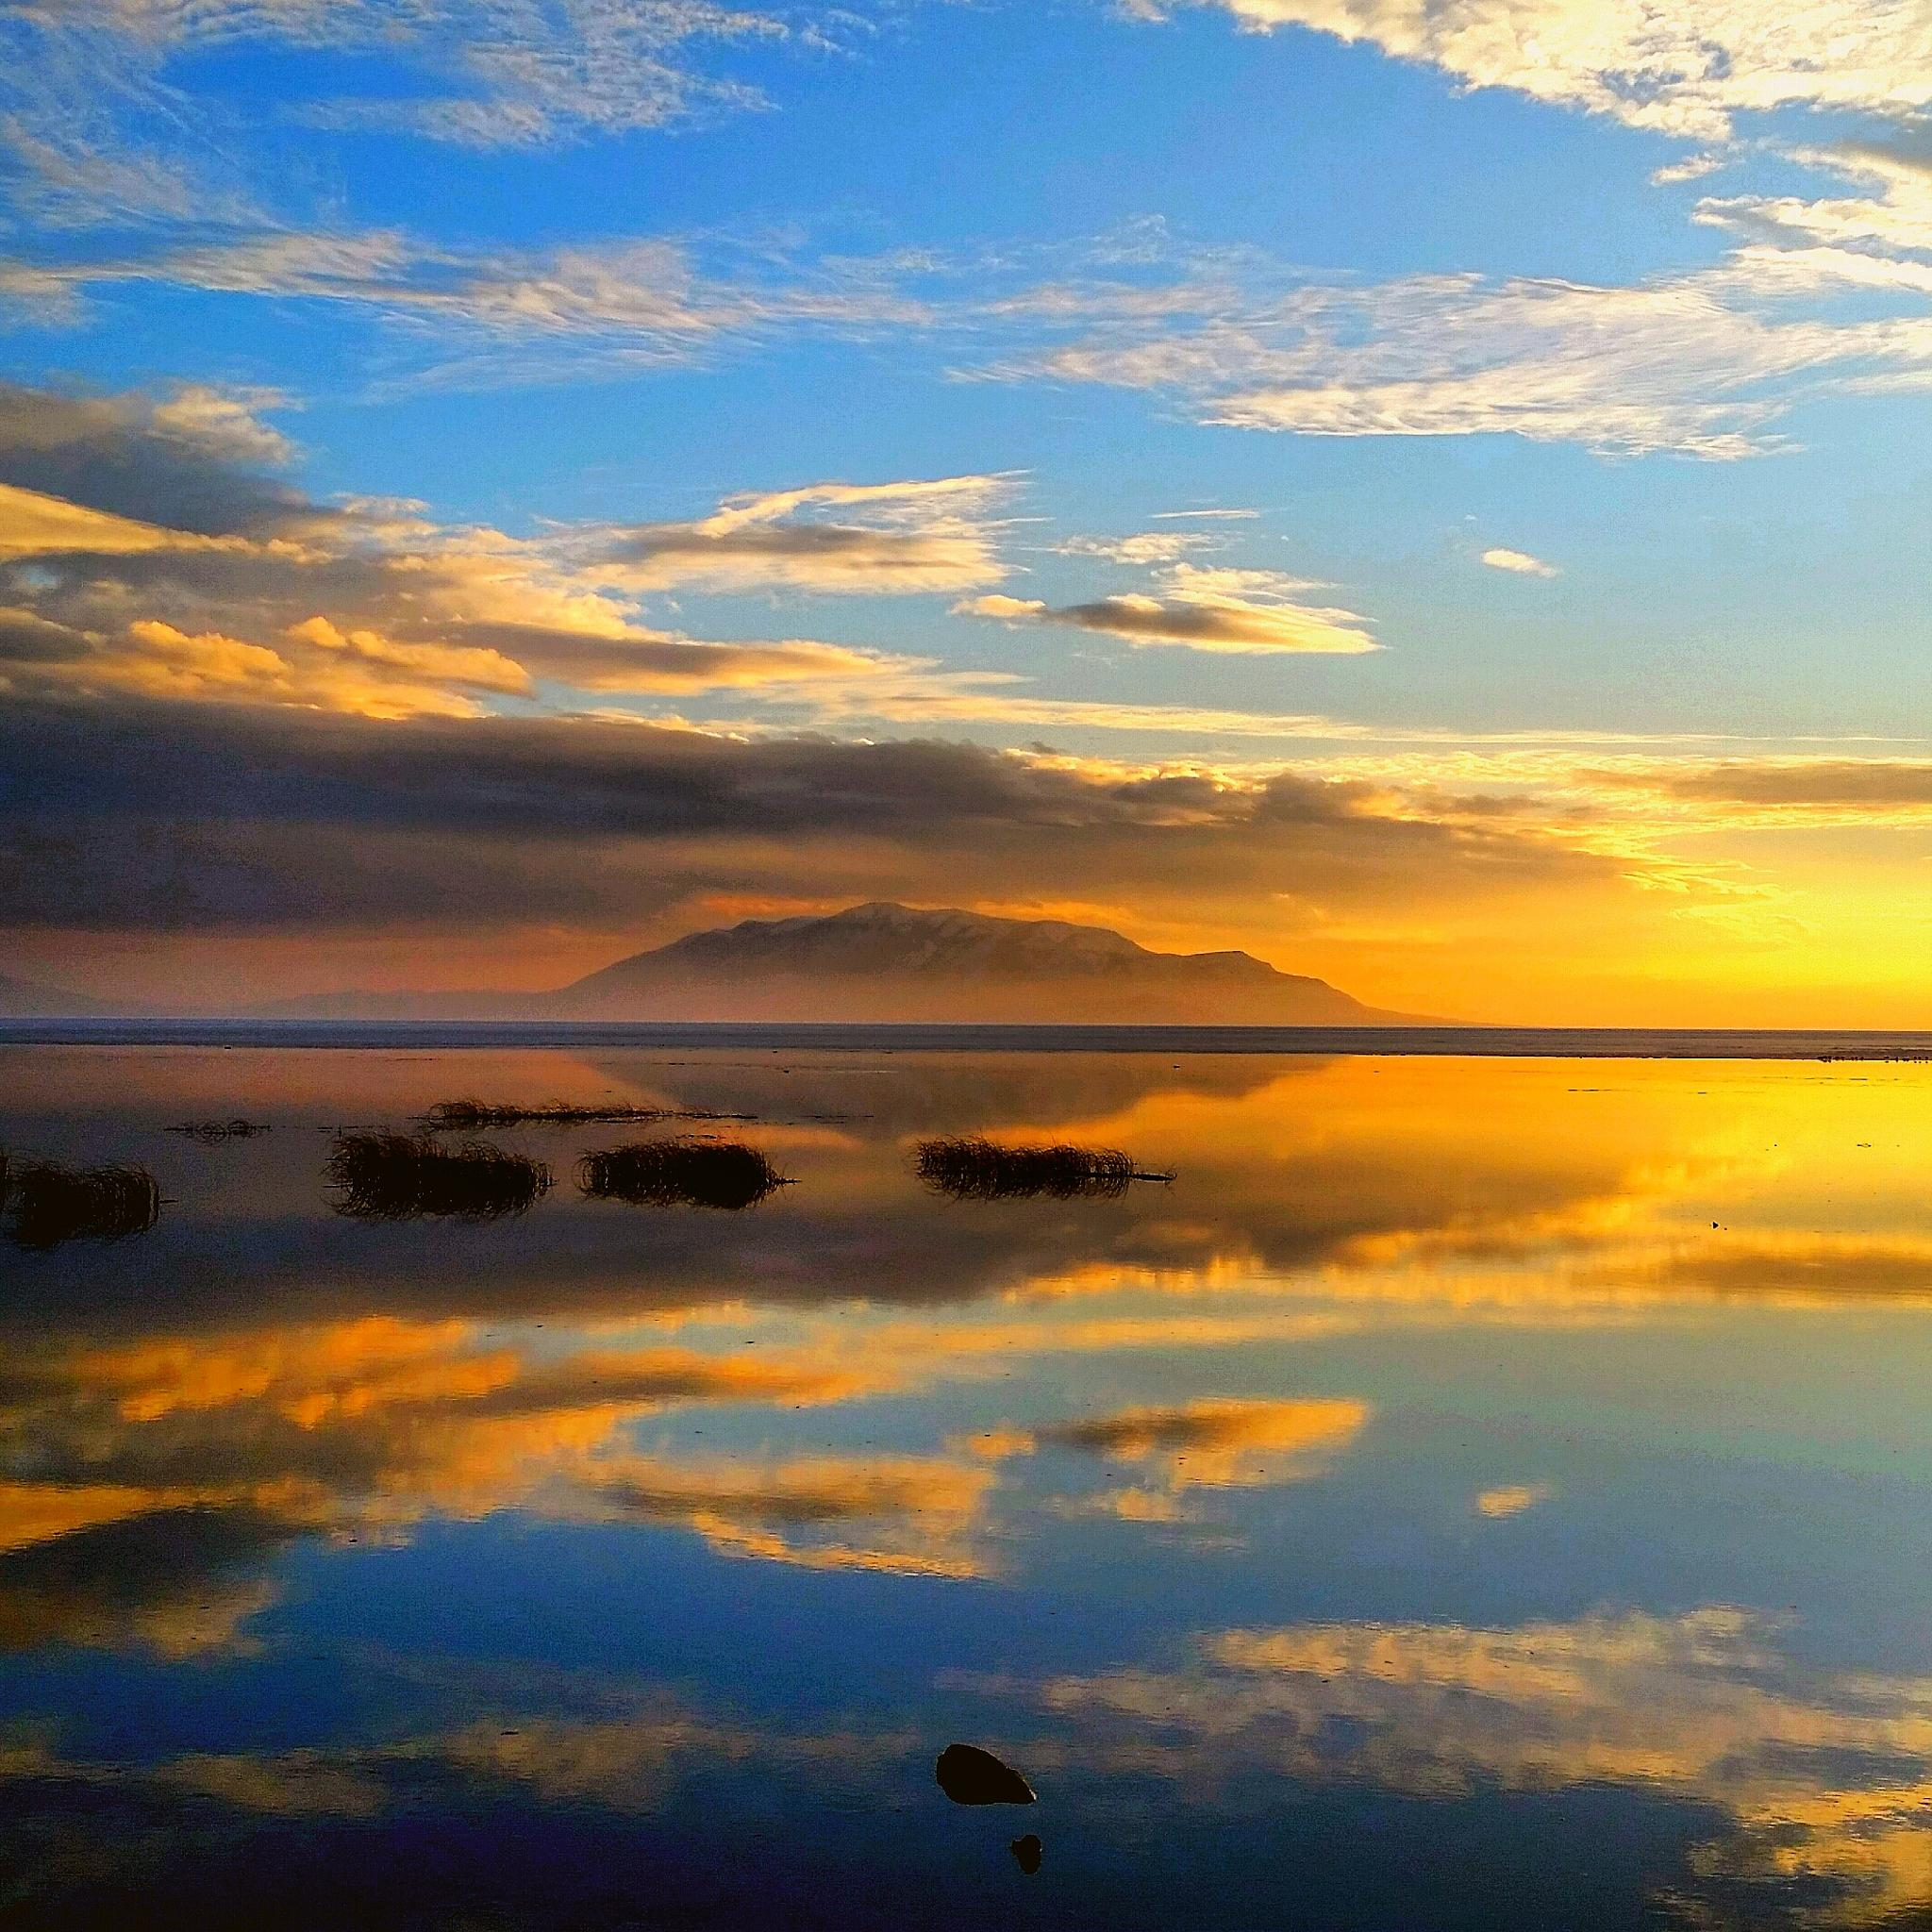 Utah Lake Reflection by Garth Rogers